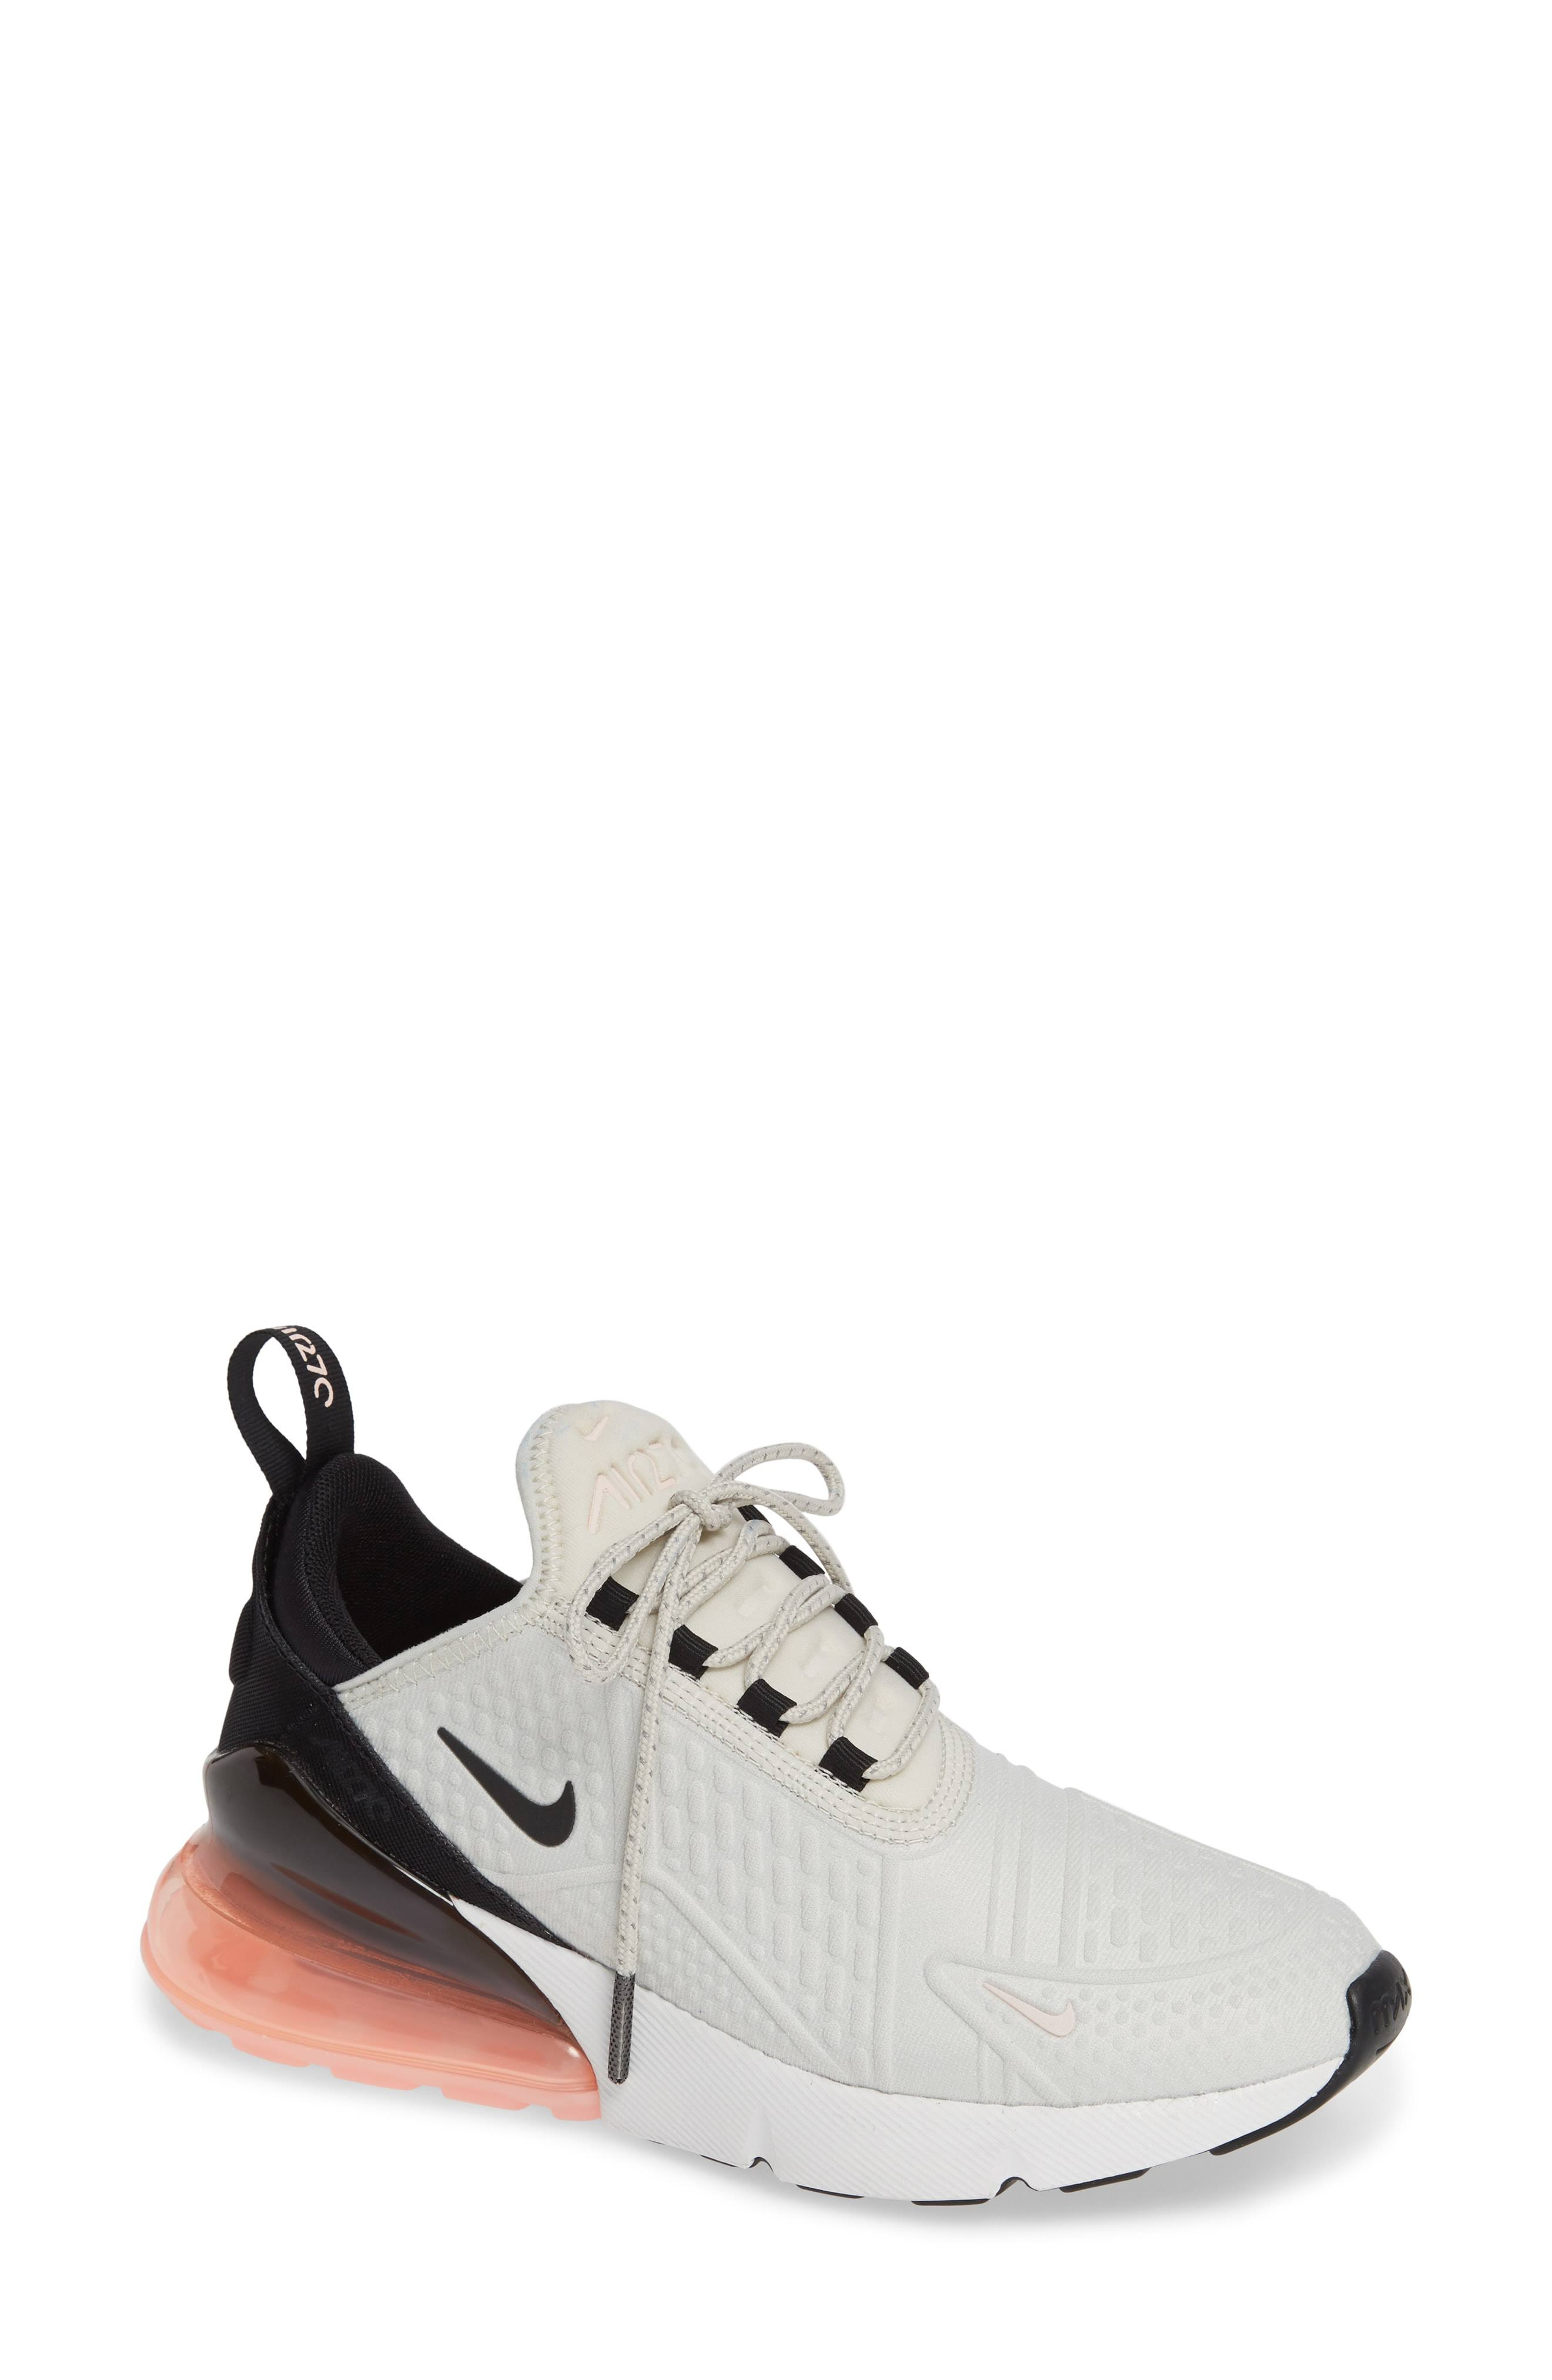 Mujer Air Tamaño Bone 5 Para 270 Ar0499002 Nike Light Zapatos 6 Max Se Bf1dRFq